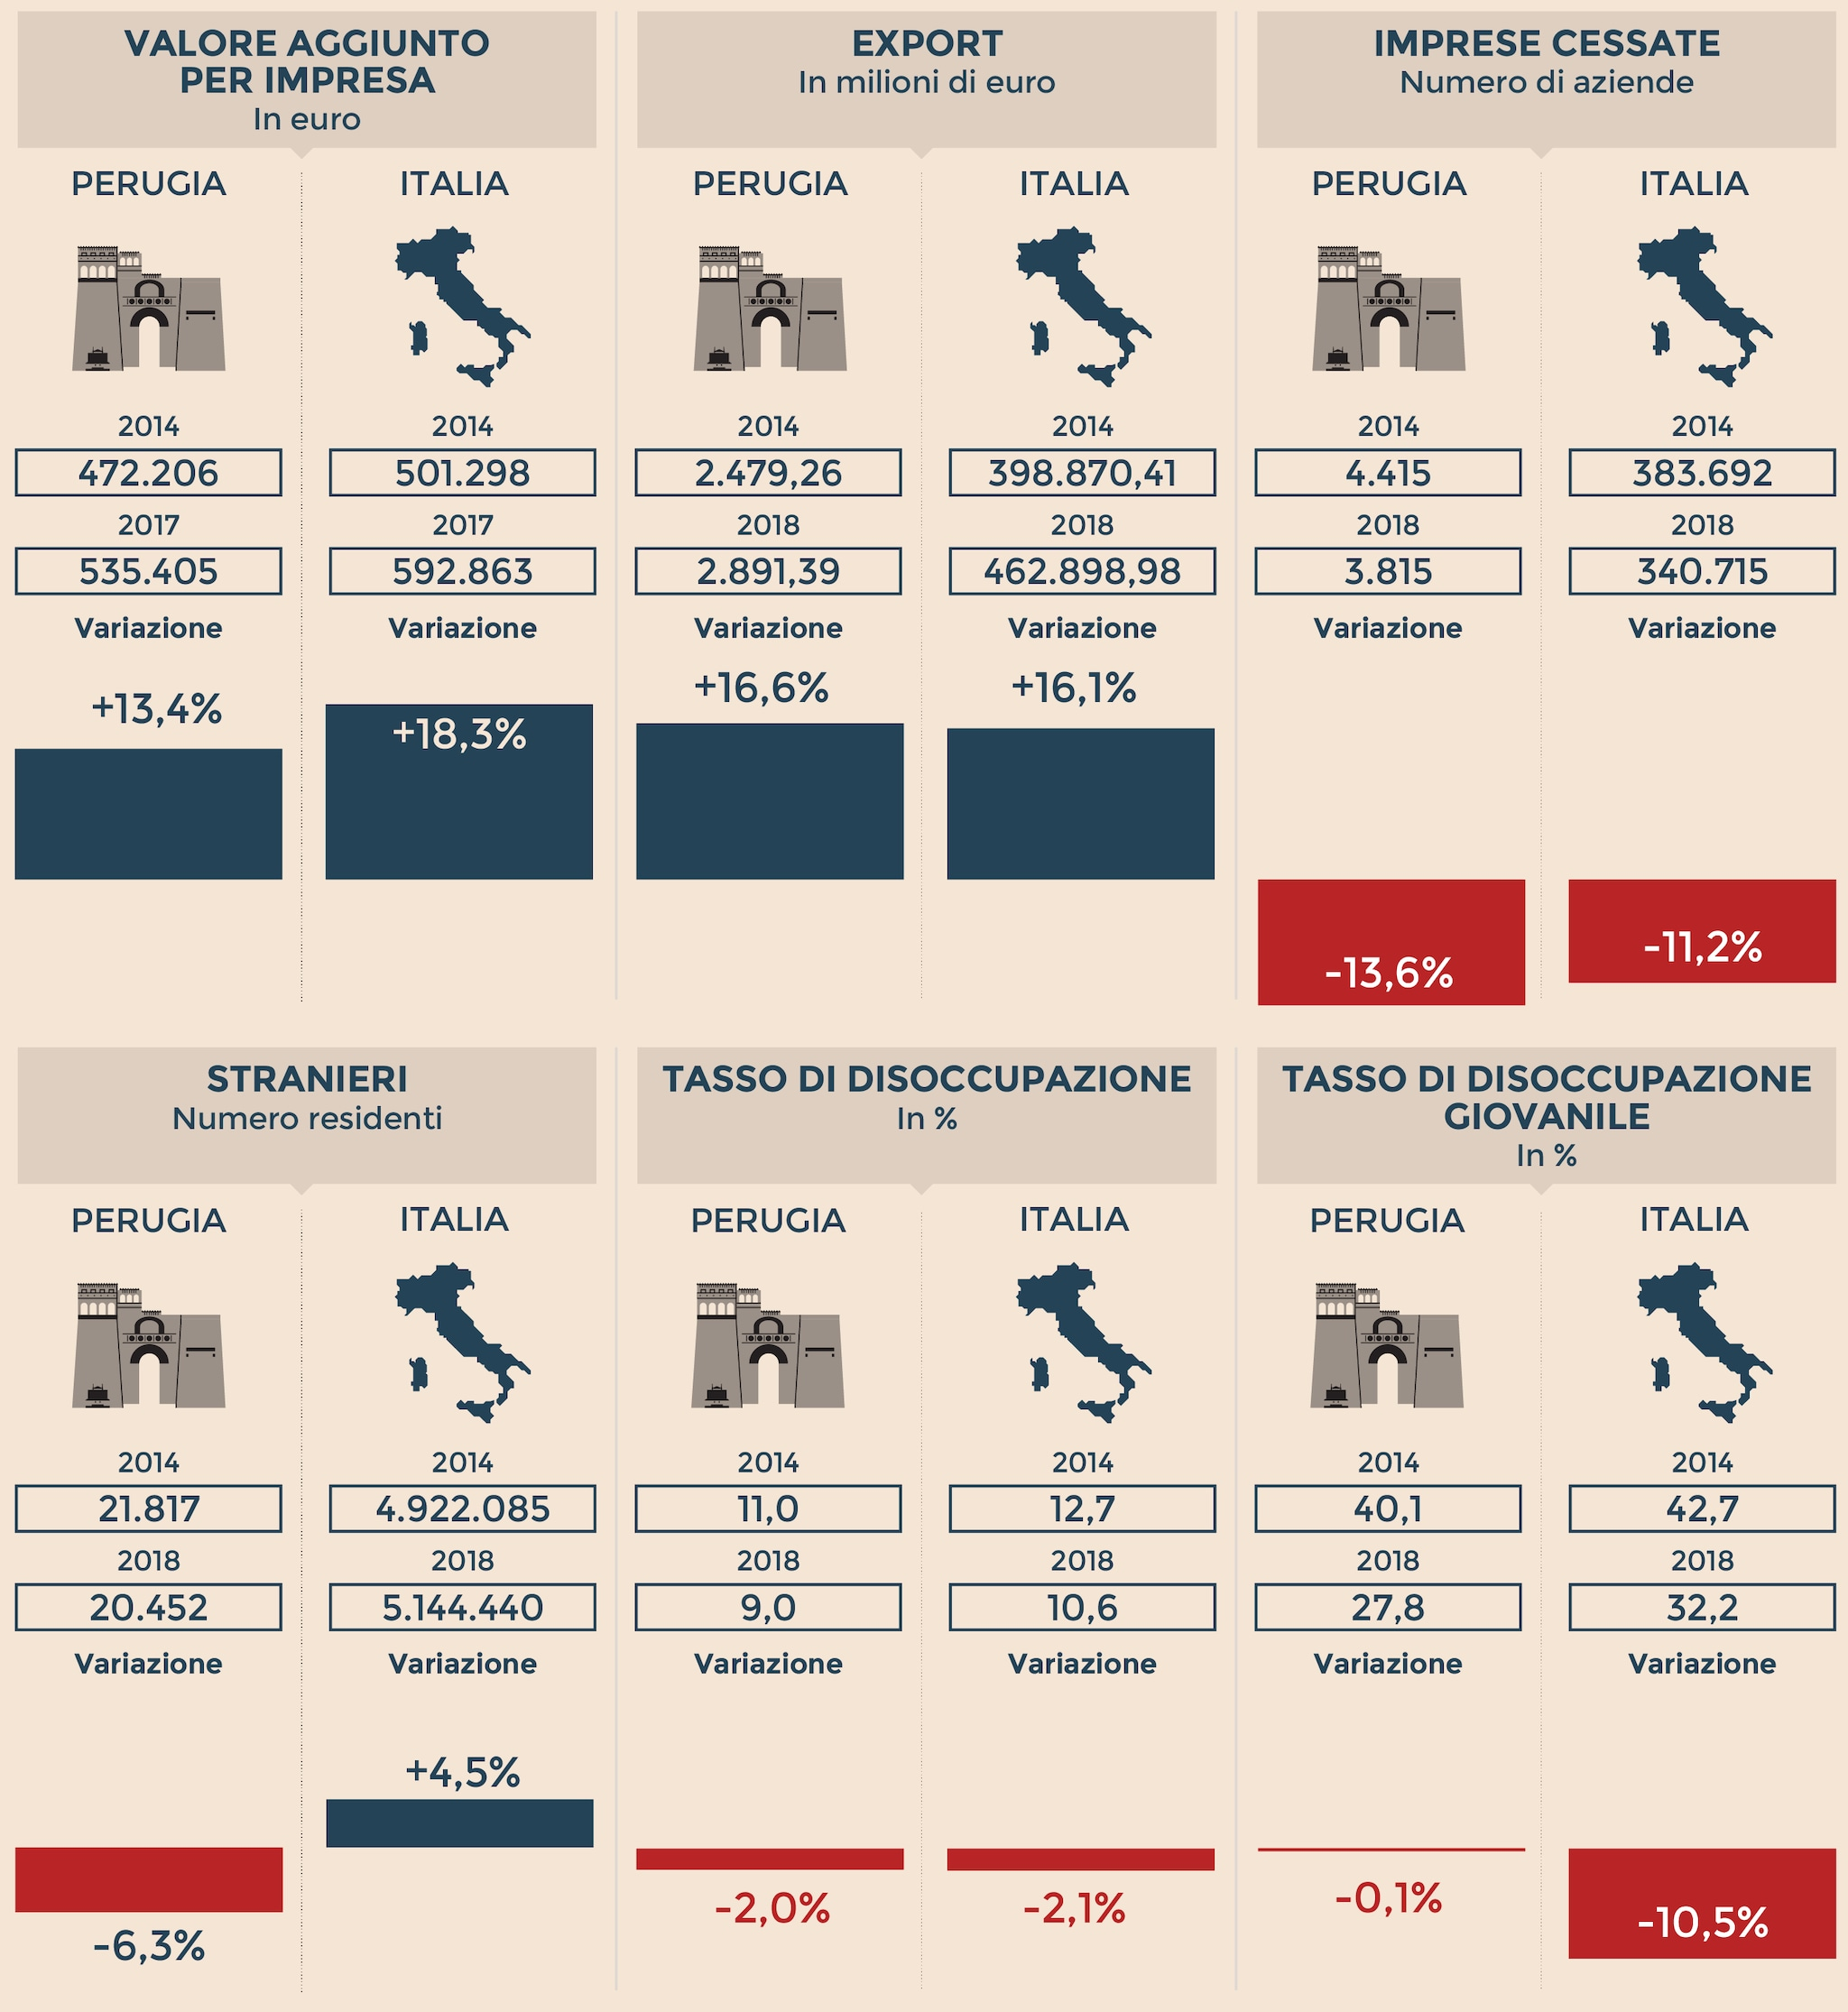 'IDENTIKIT ECONOMICO DI PERUGIA